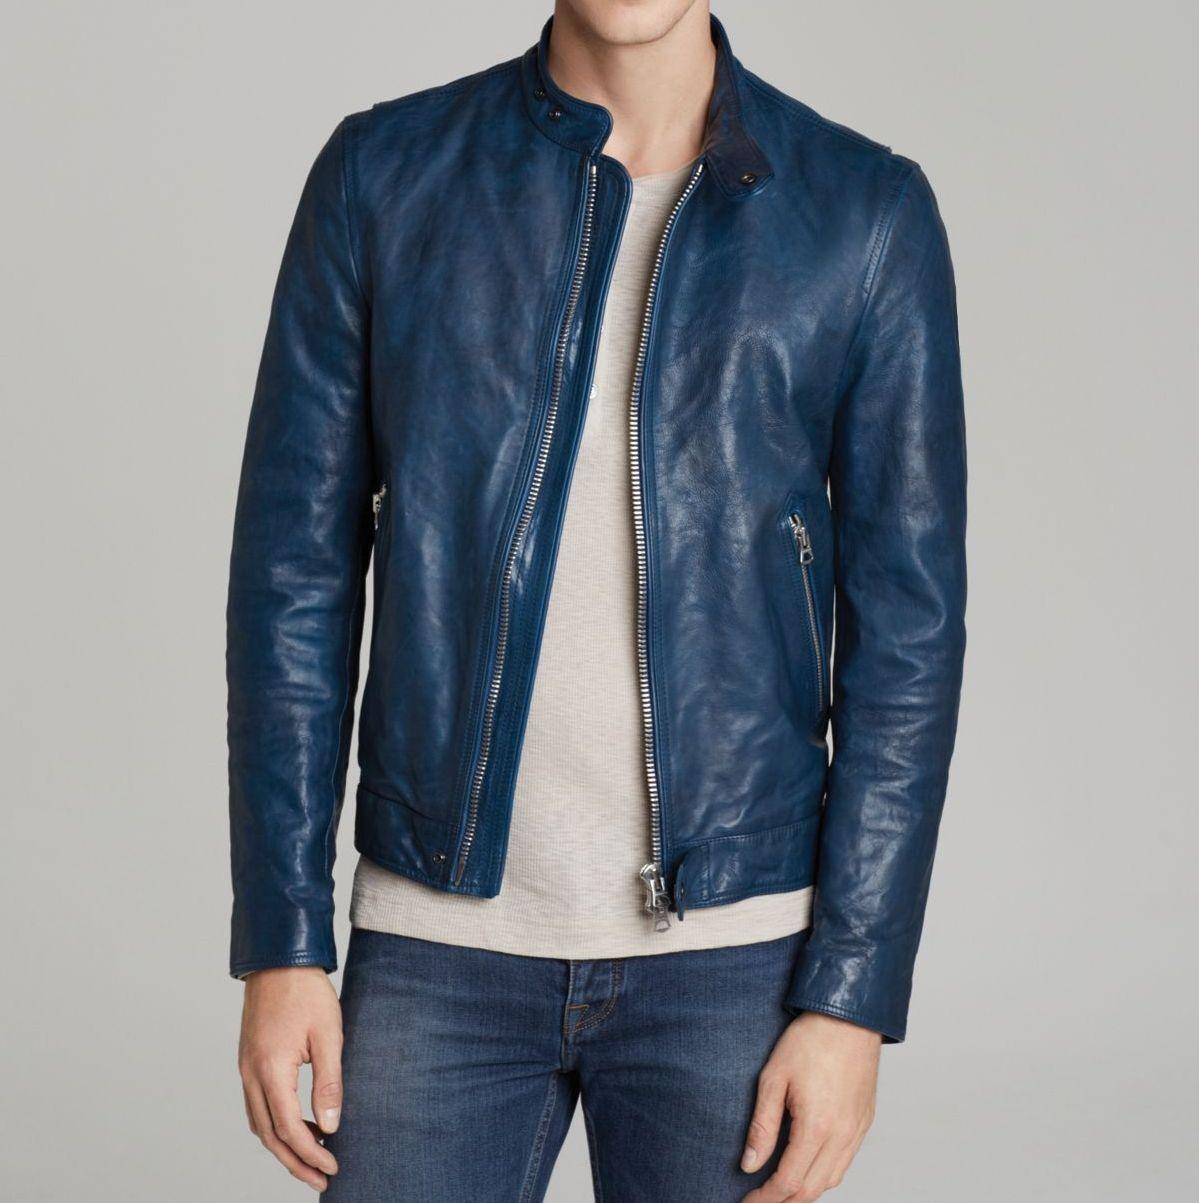 Prastara Men Blue Leather Jacket Biker Soft Lambskin Jacket